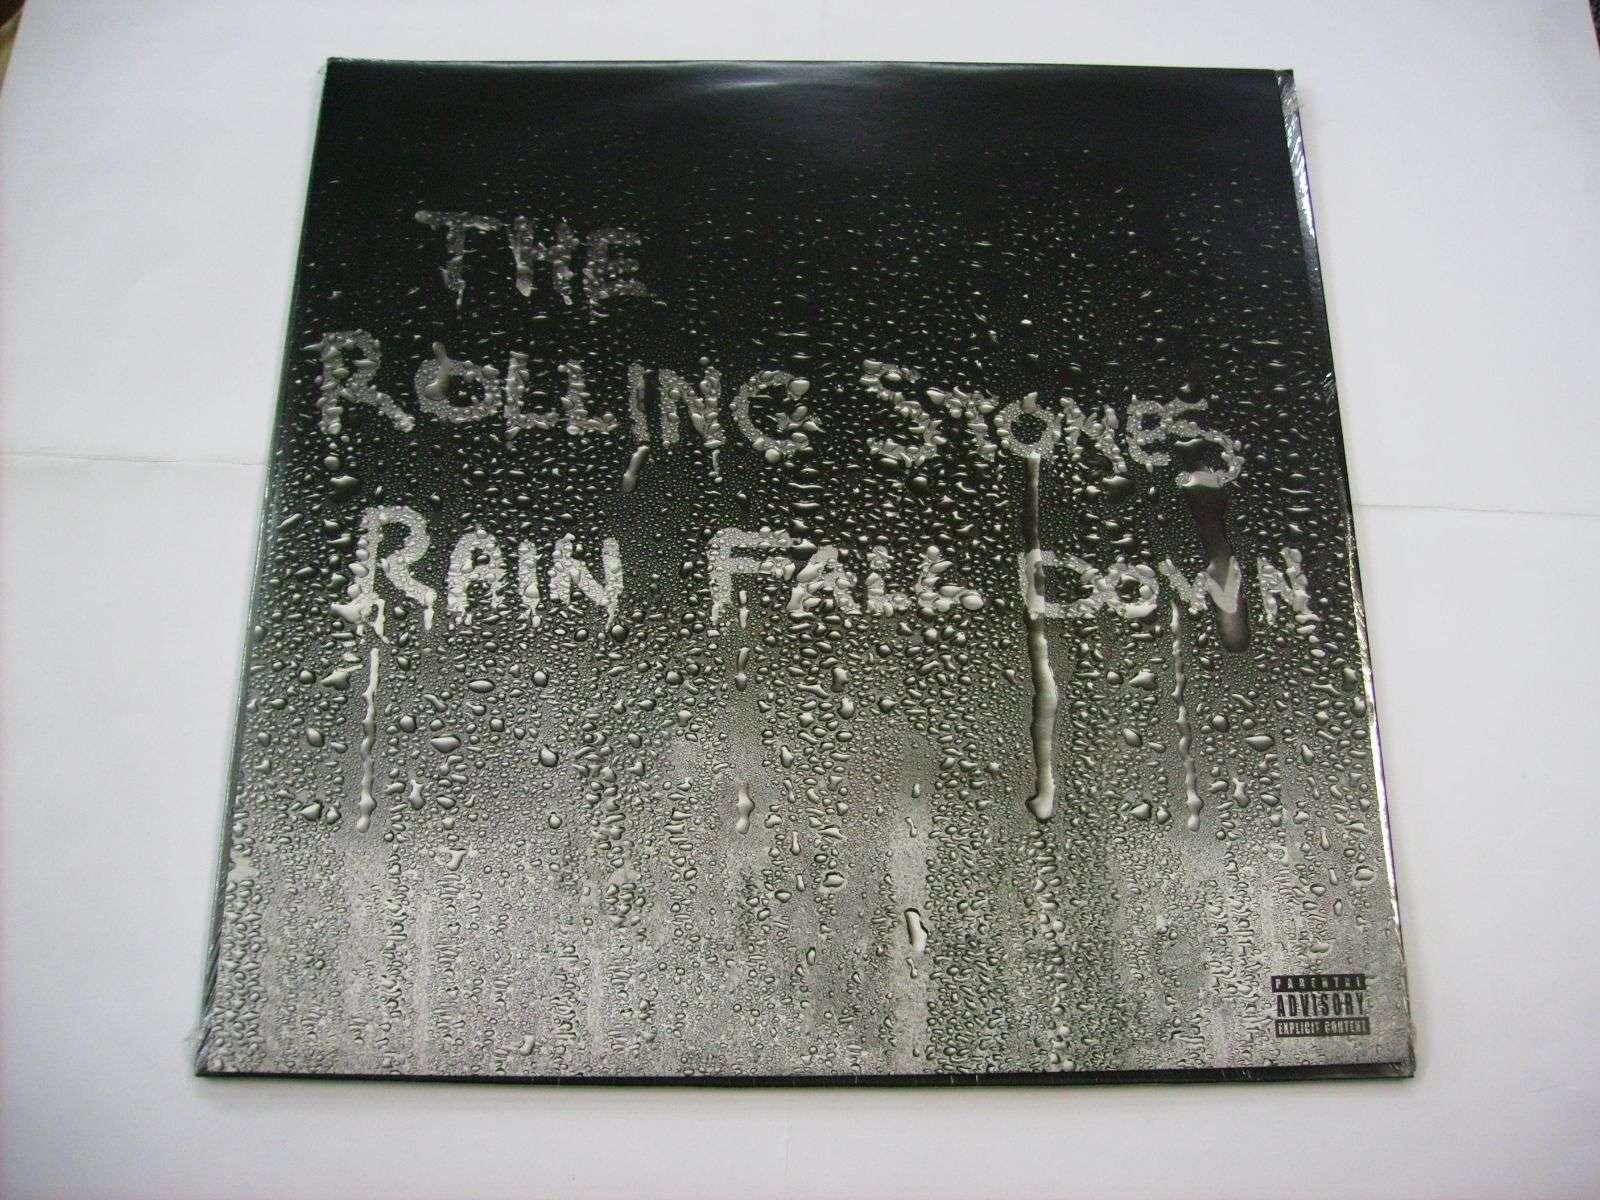 Rolling Stones - Rain Fall Down Single